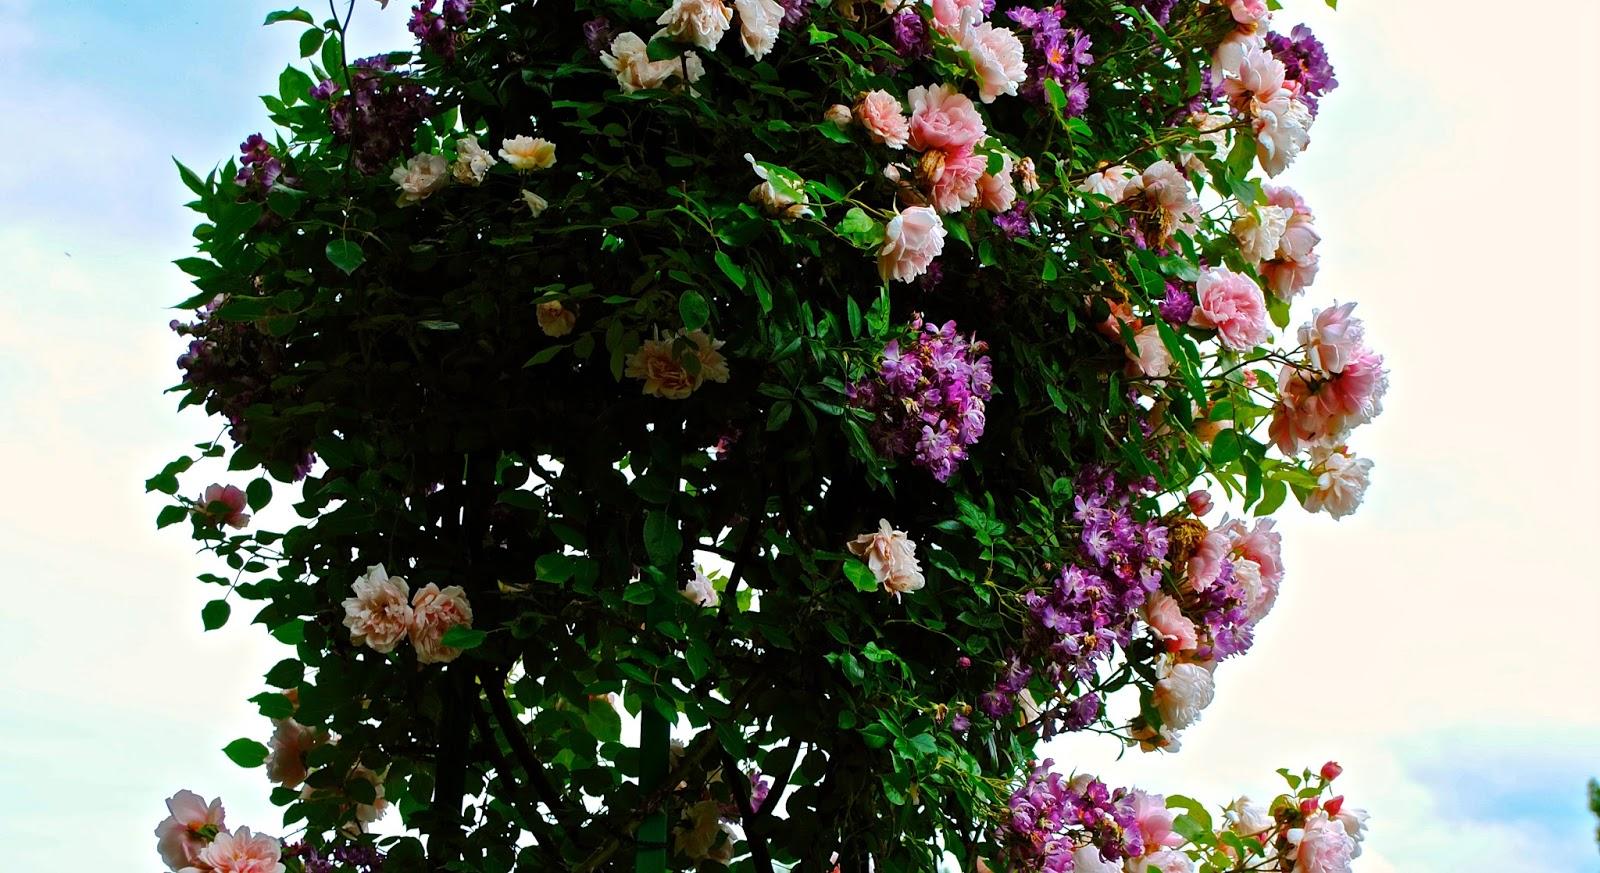 Flowers from Monet's Garden